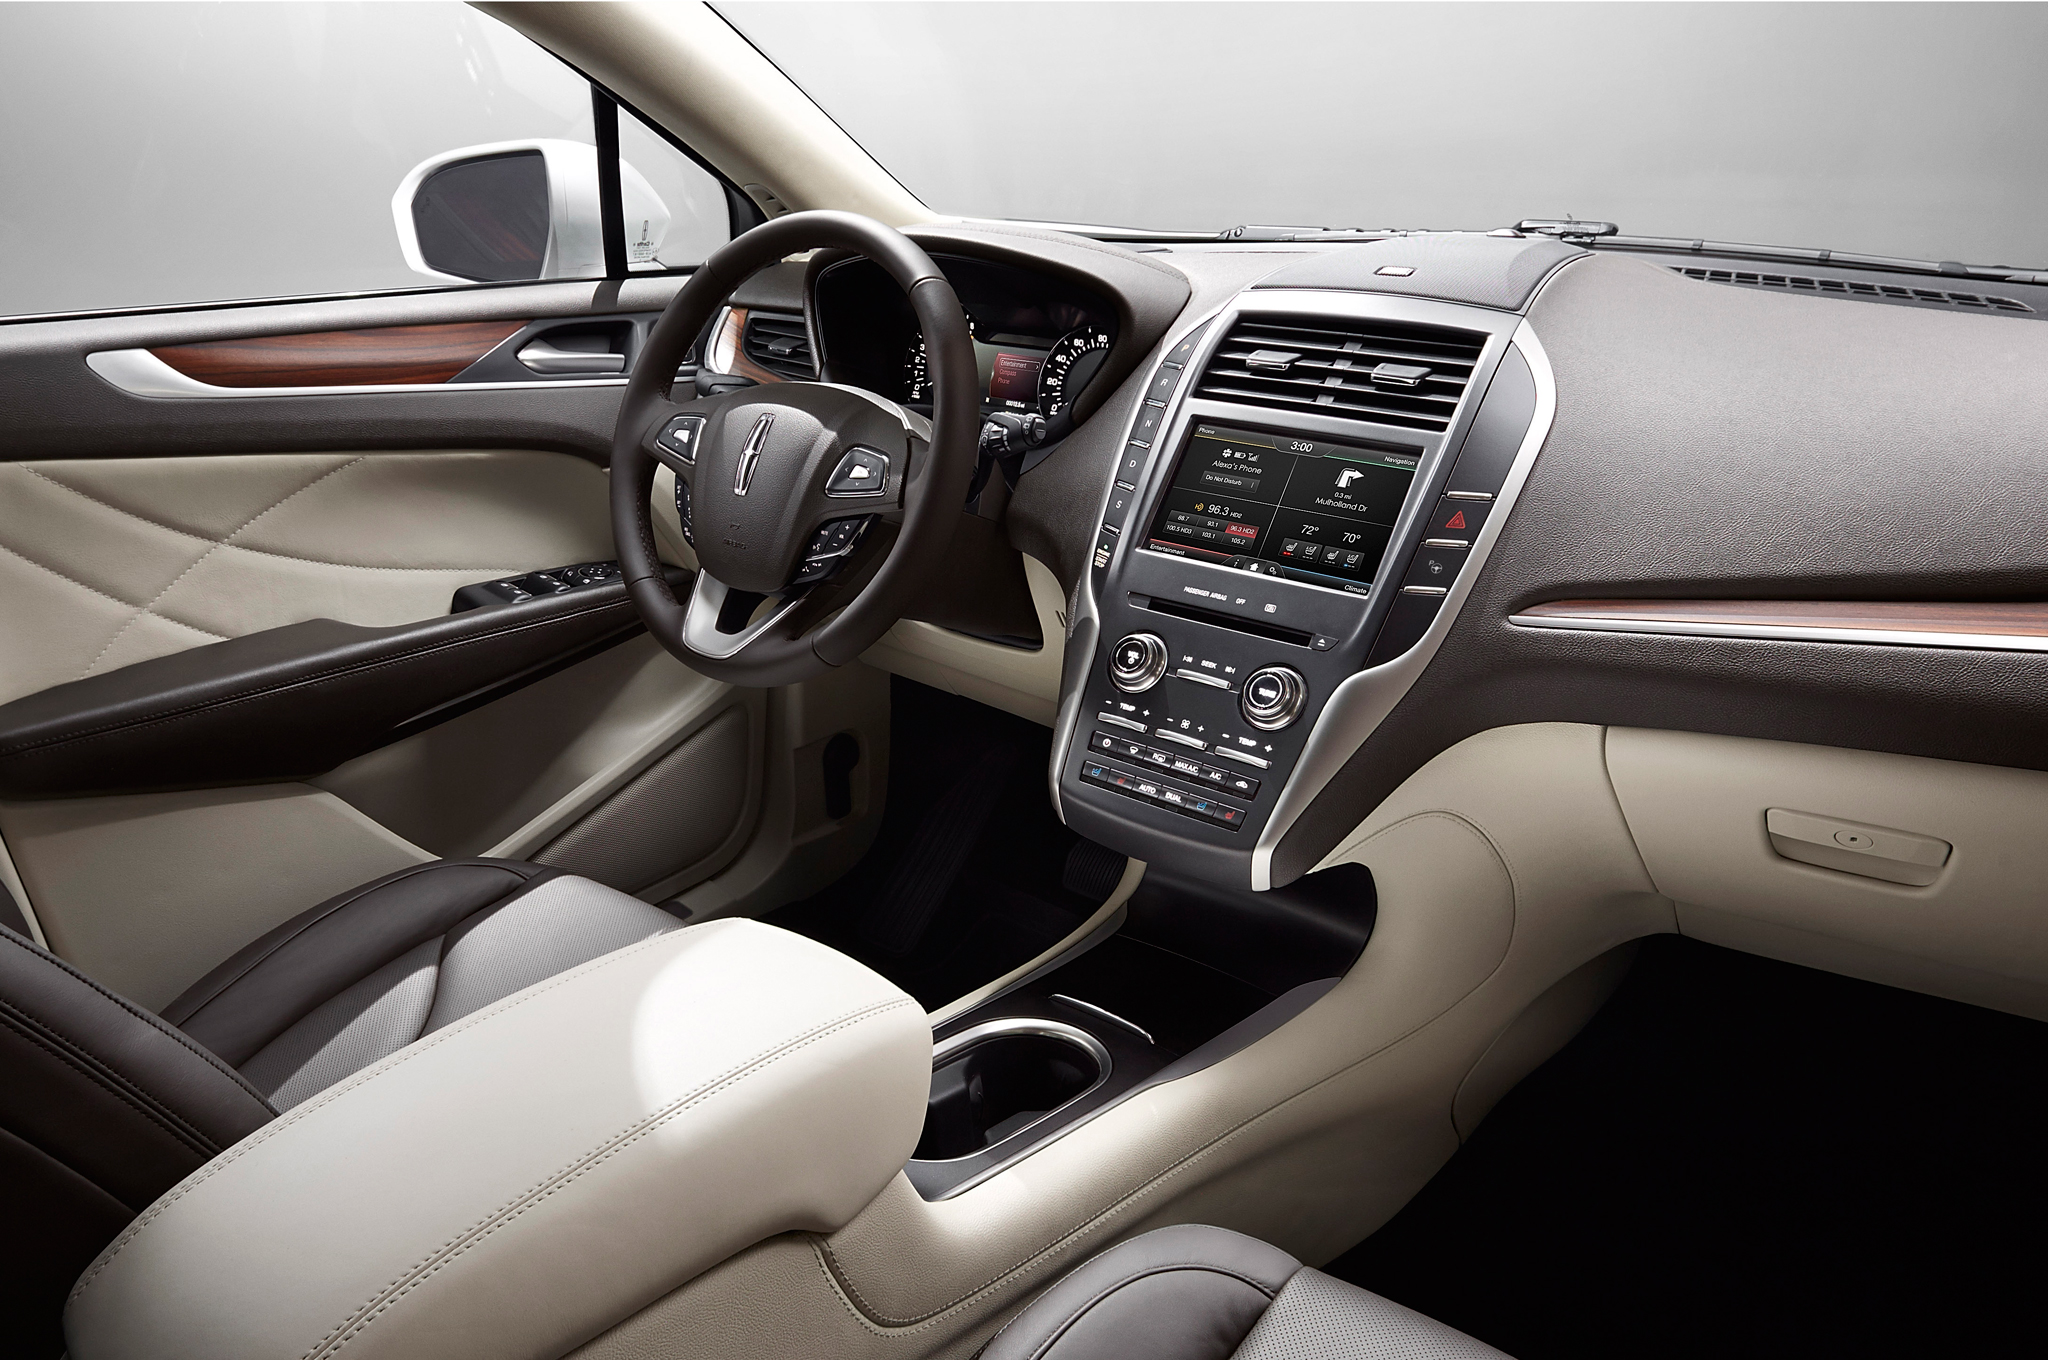 2015 Lincoln MKC Front Seats Interior